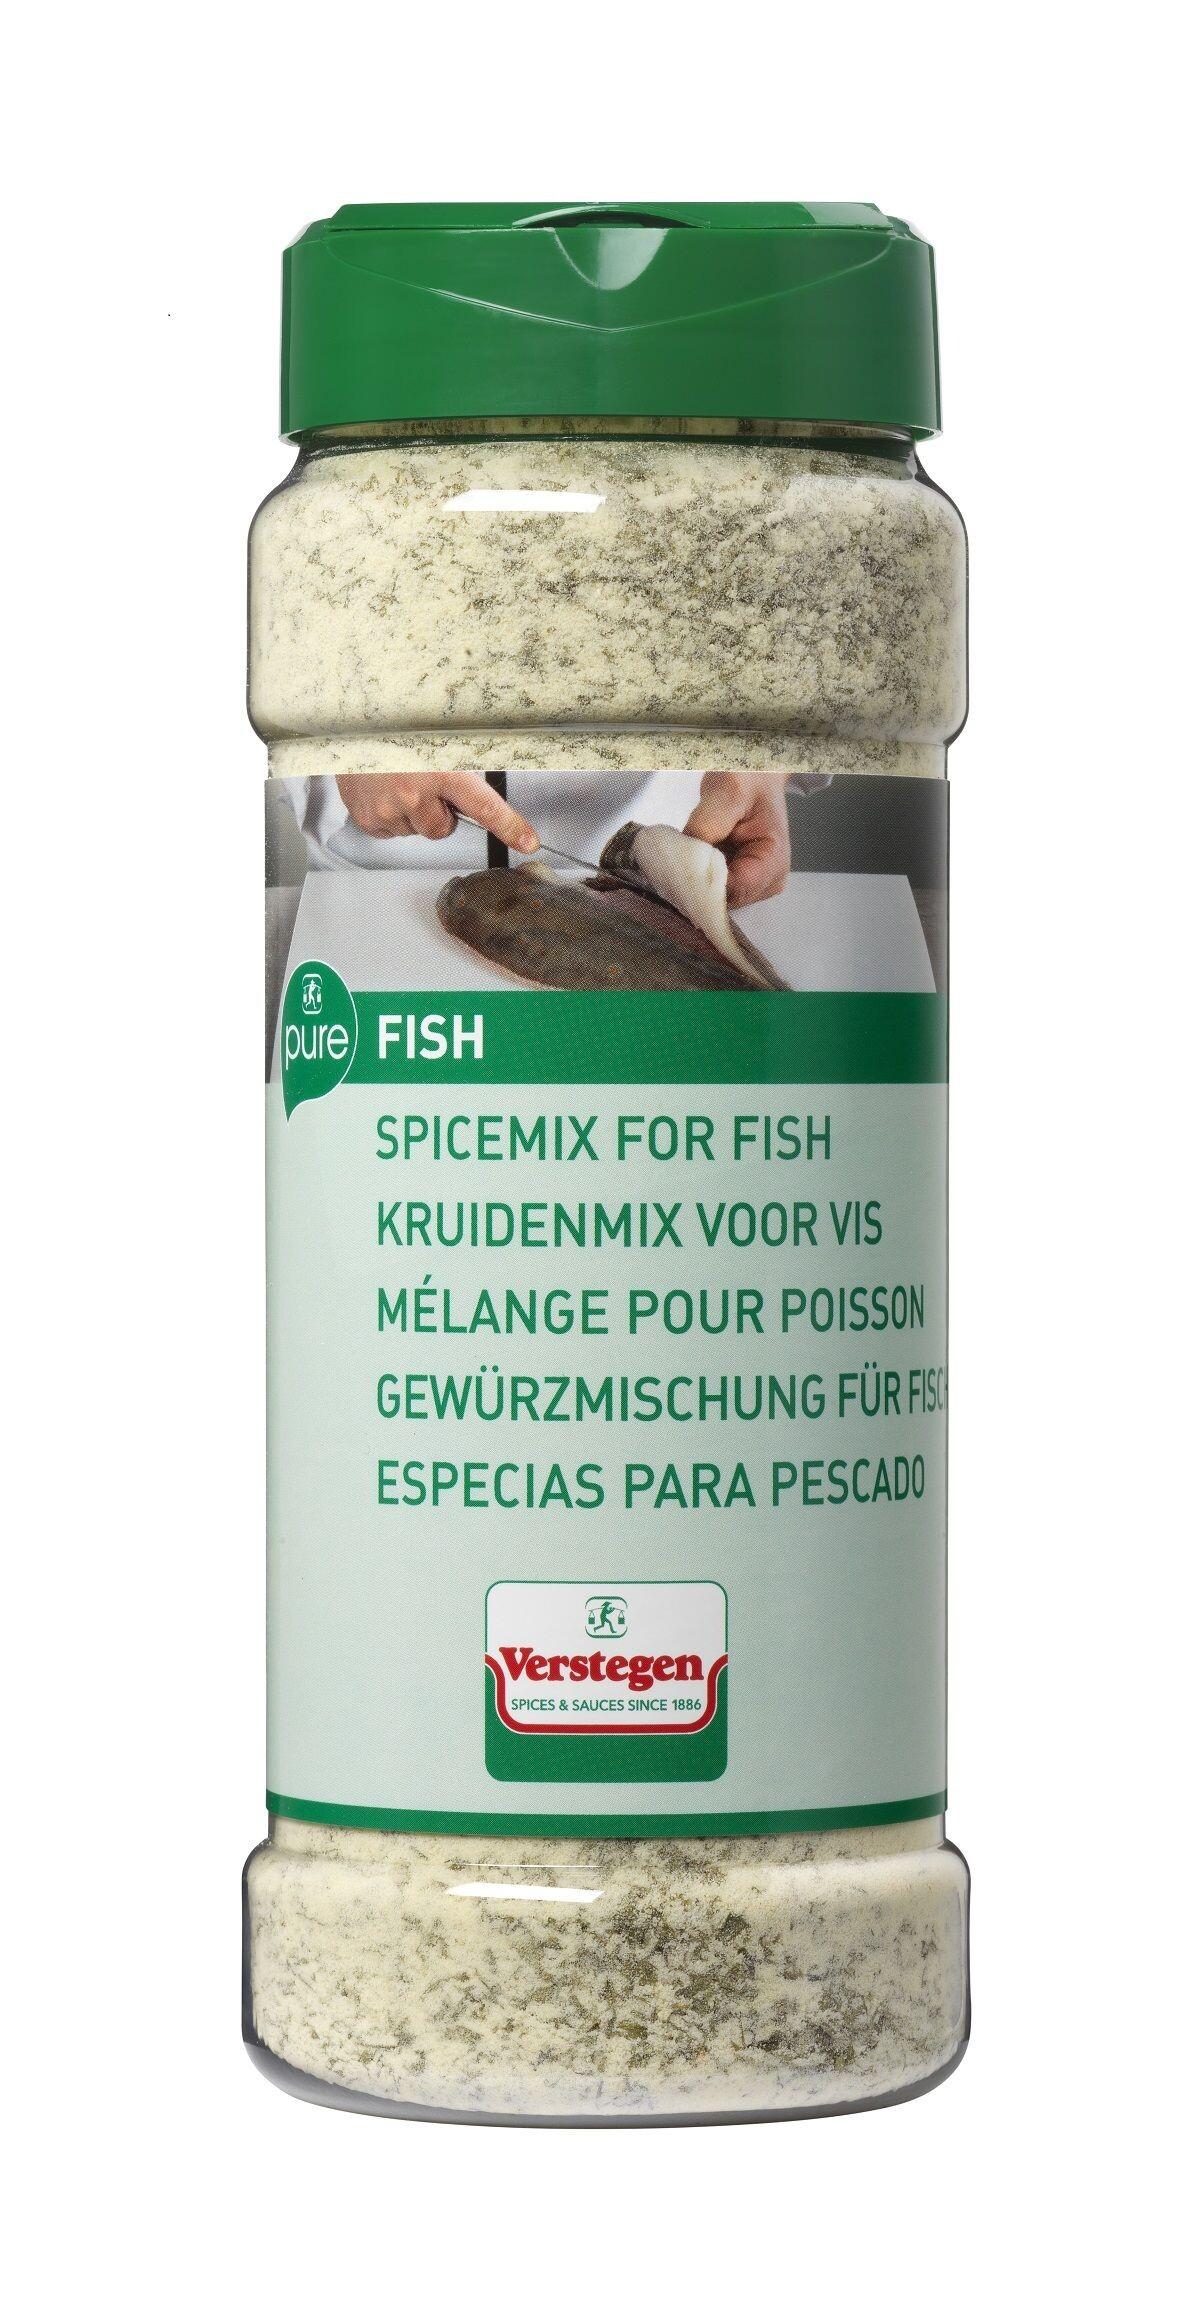 Verstegen Spice Mix for Fish 500gr Pure